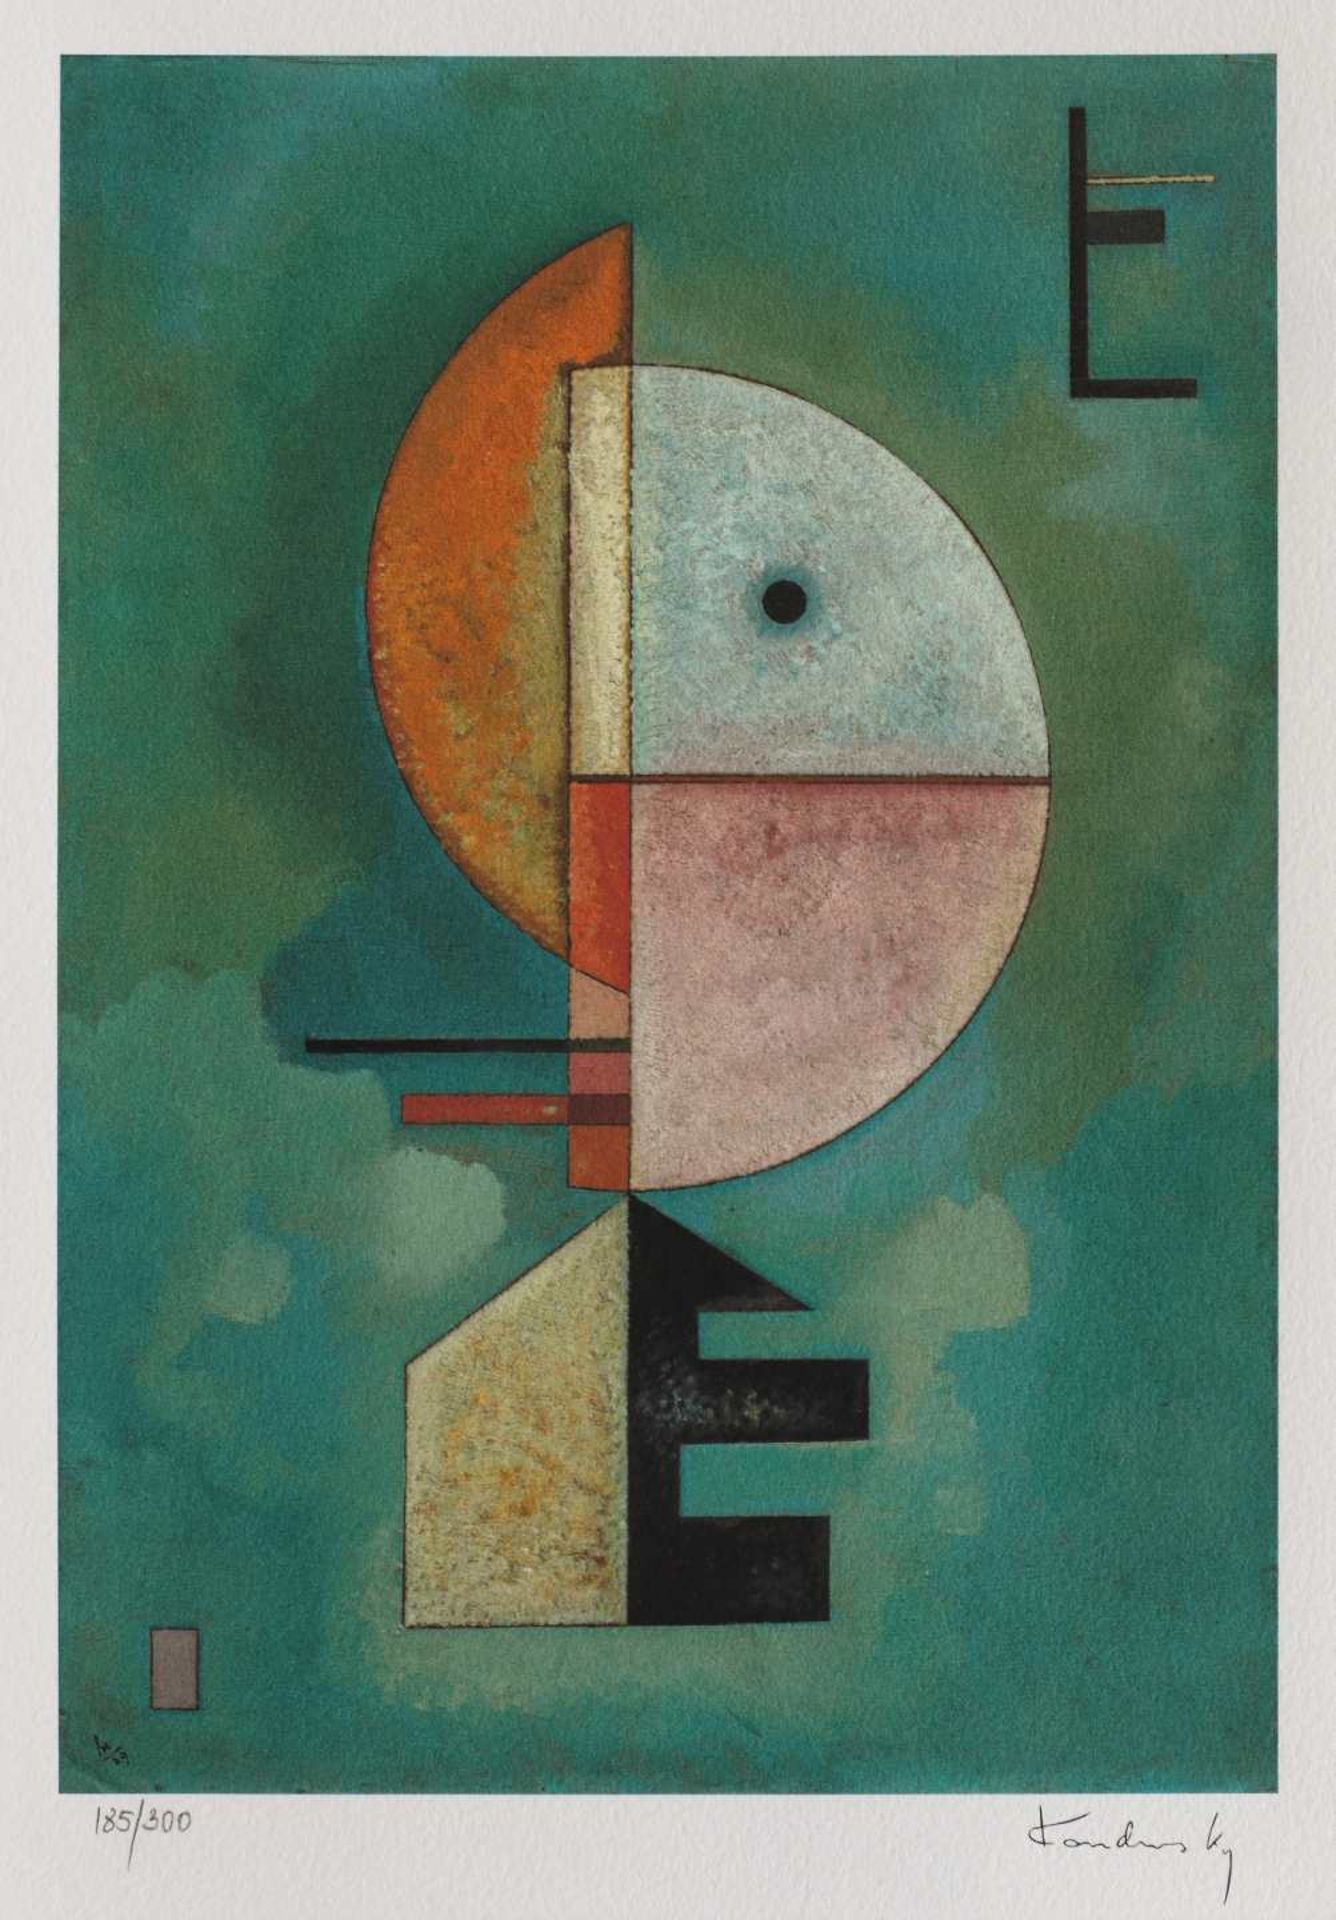 Wassily Kandinsky, UpWassily Kandinsky, Up, chromolithography, 28 × 19 cm, signed bottom right